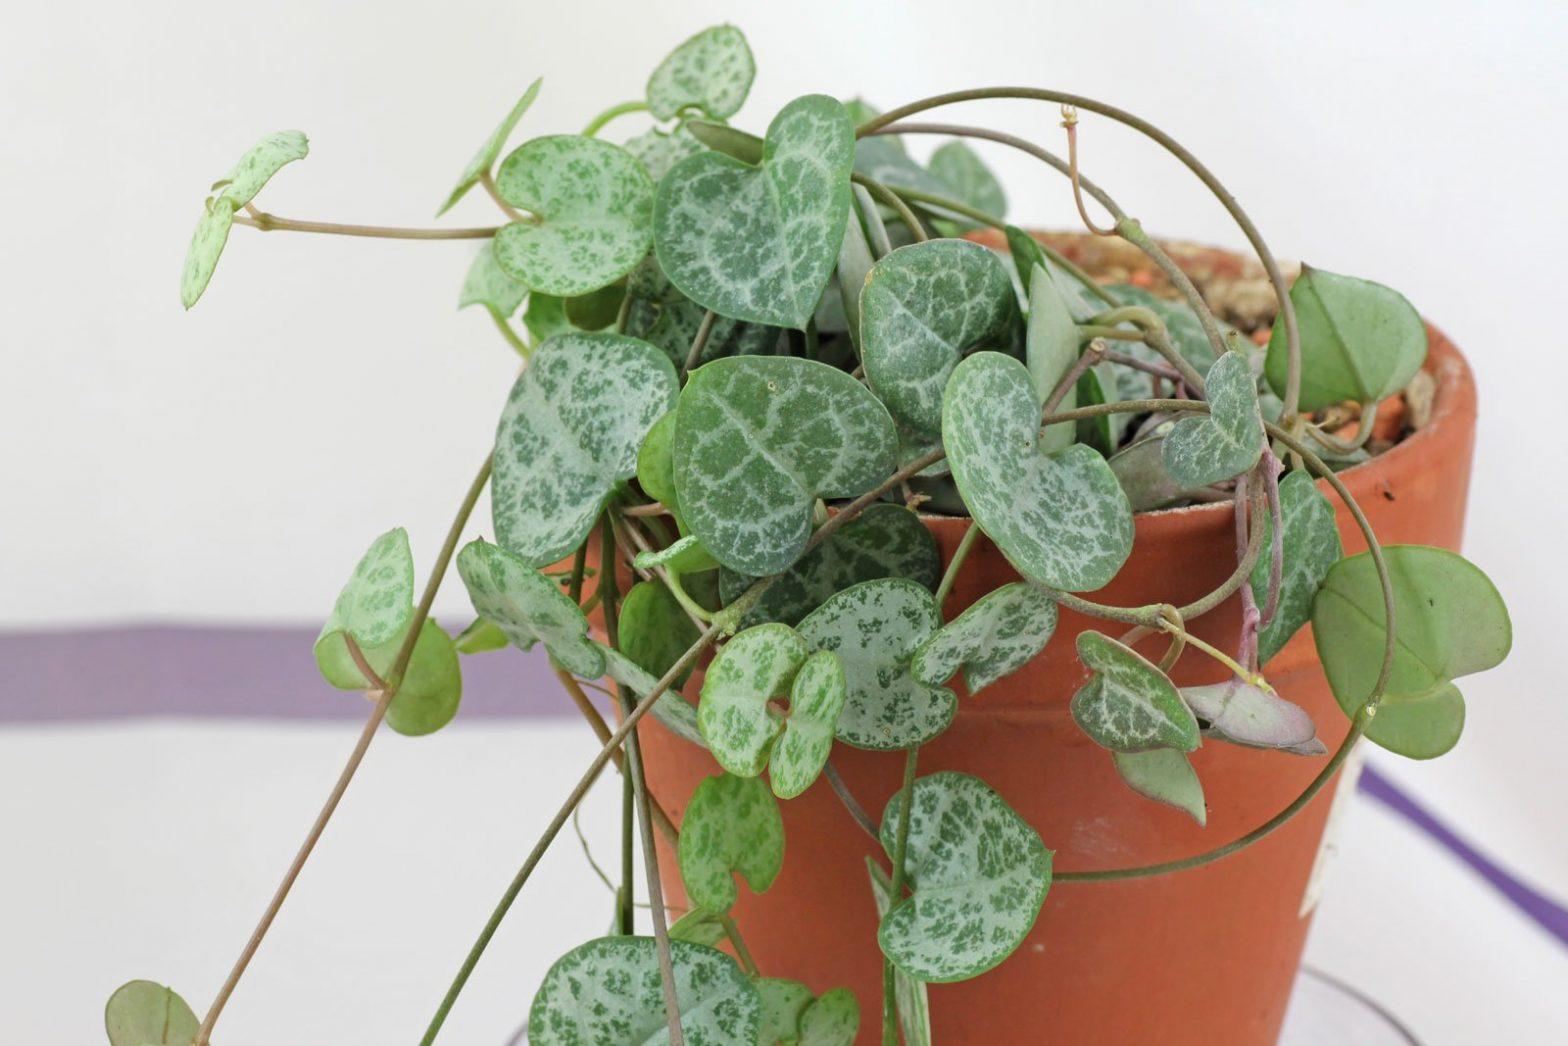 Ceropegia linearis ssp. woodii